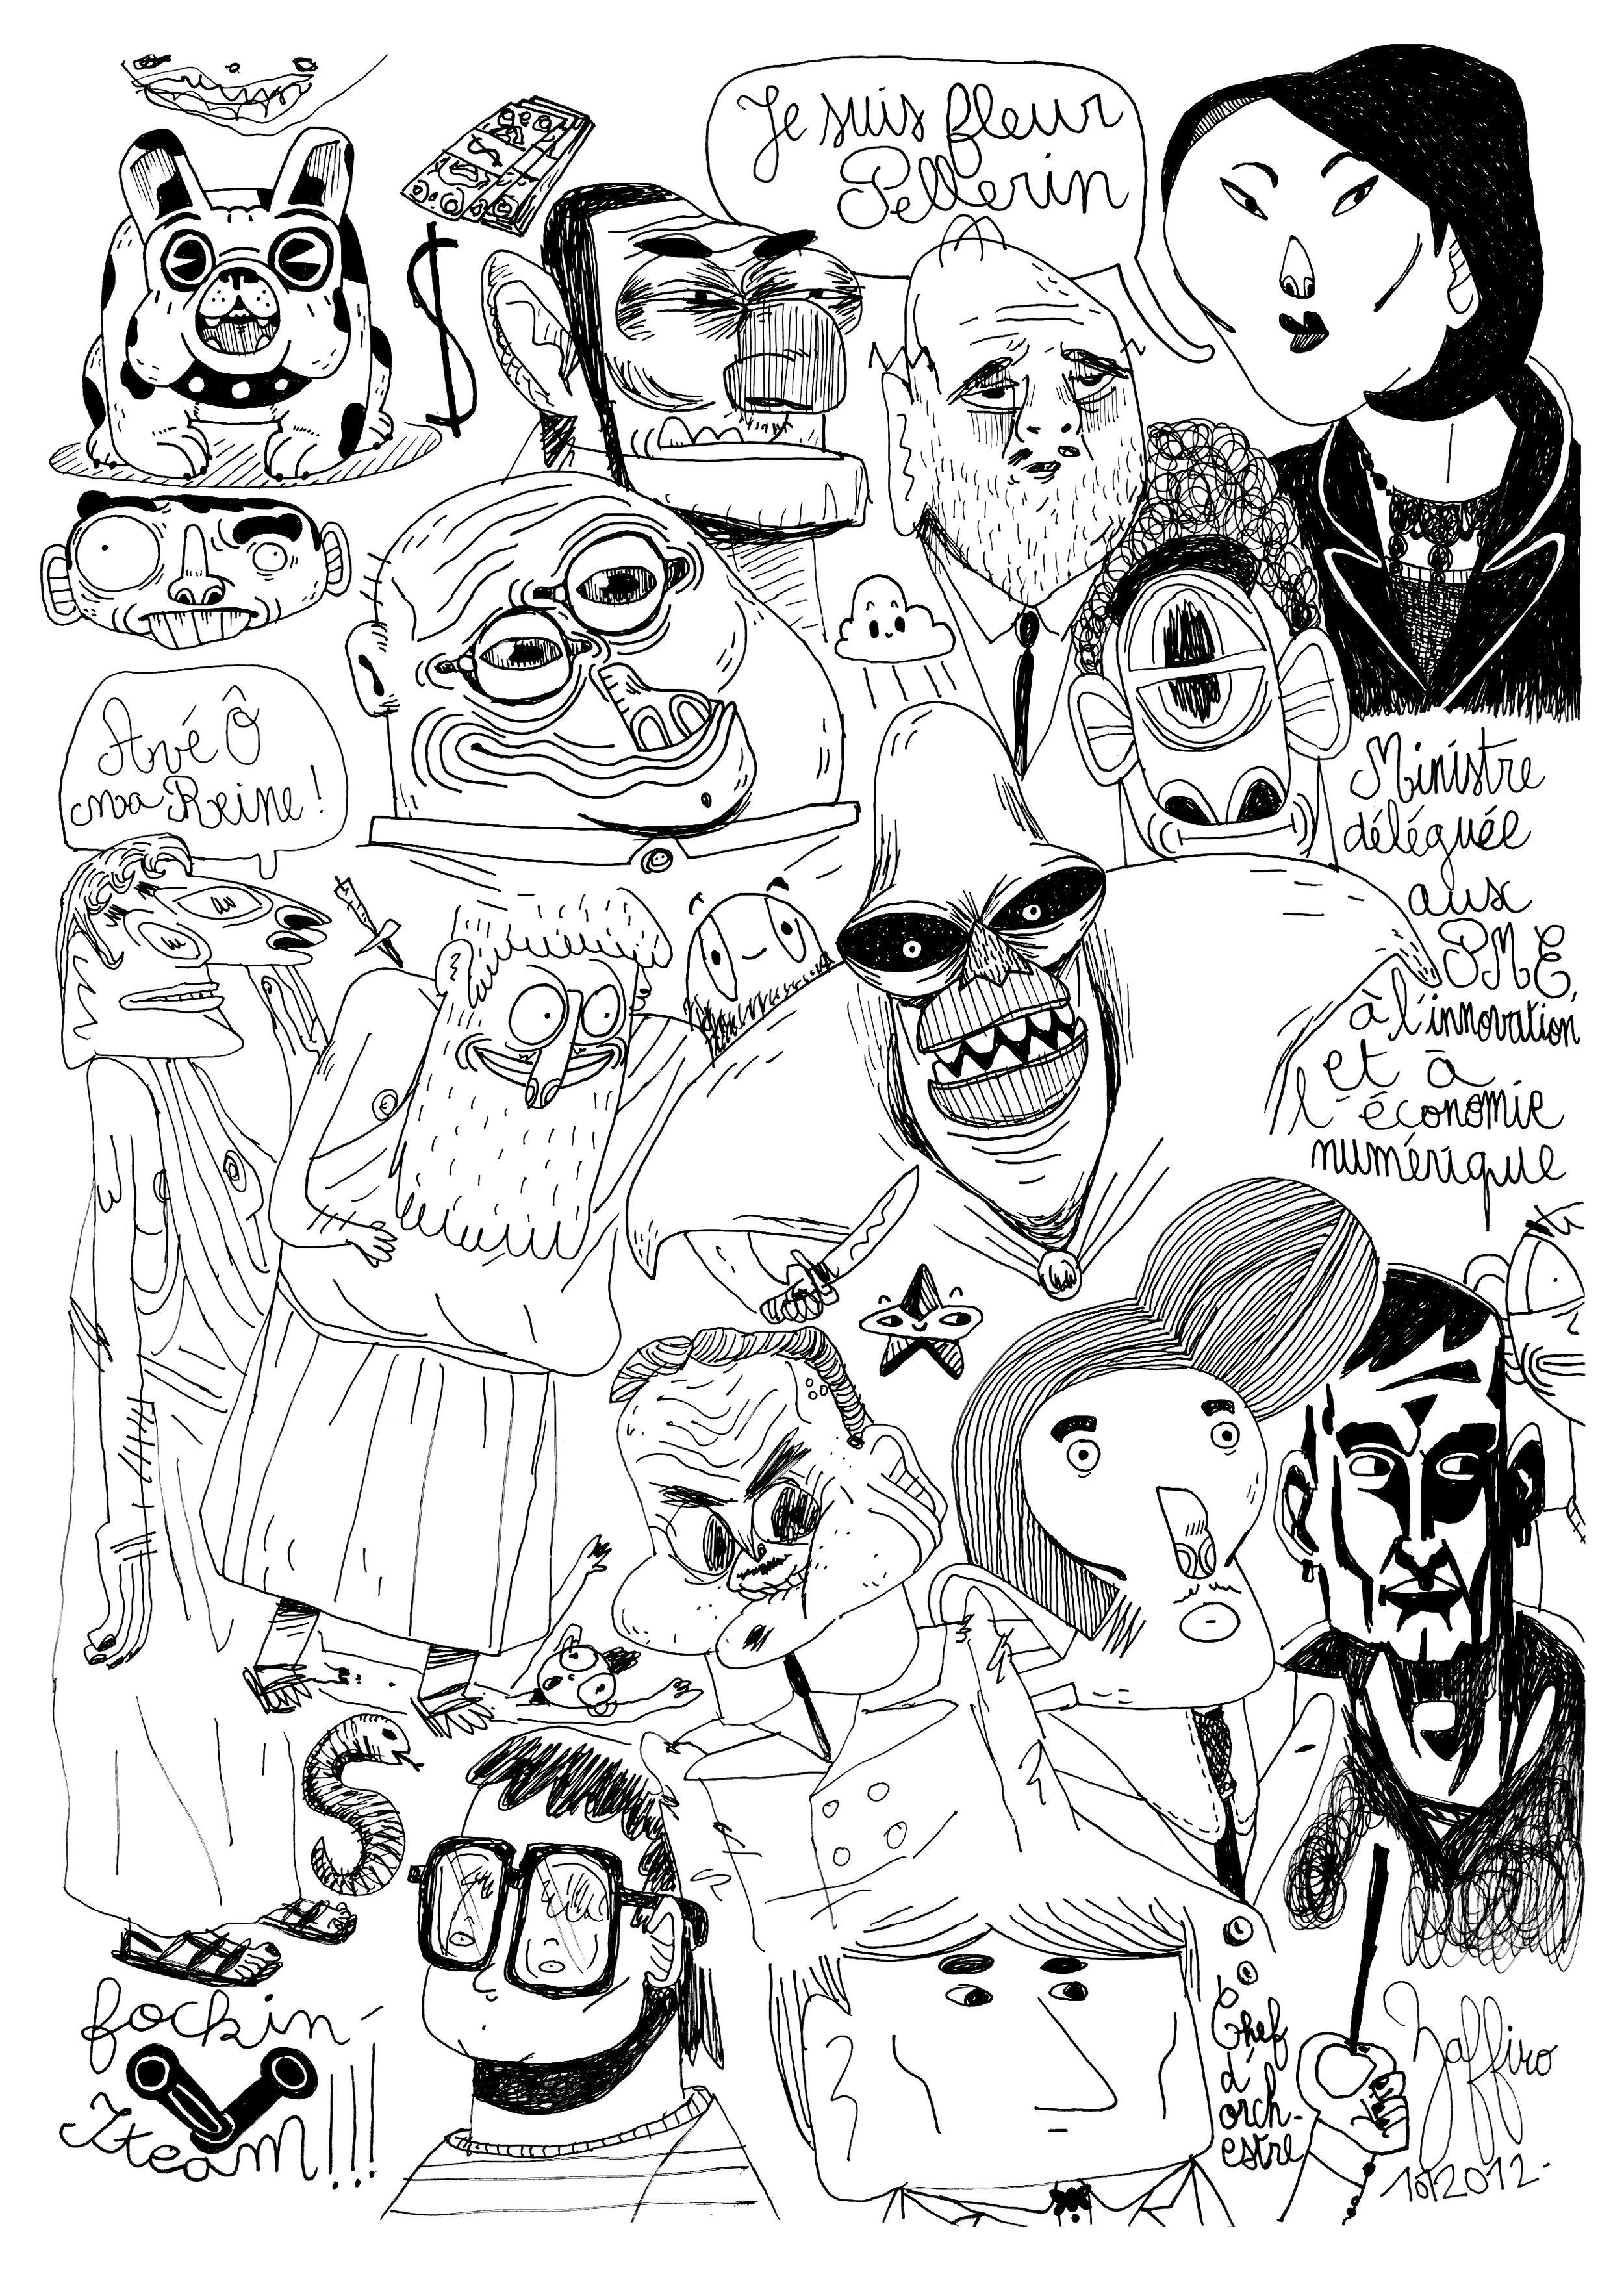 Pascal_Zaffiro_Doodle_39.jpg